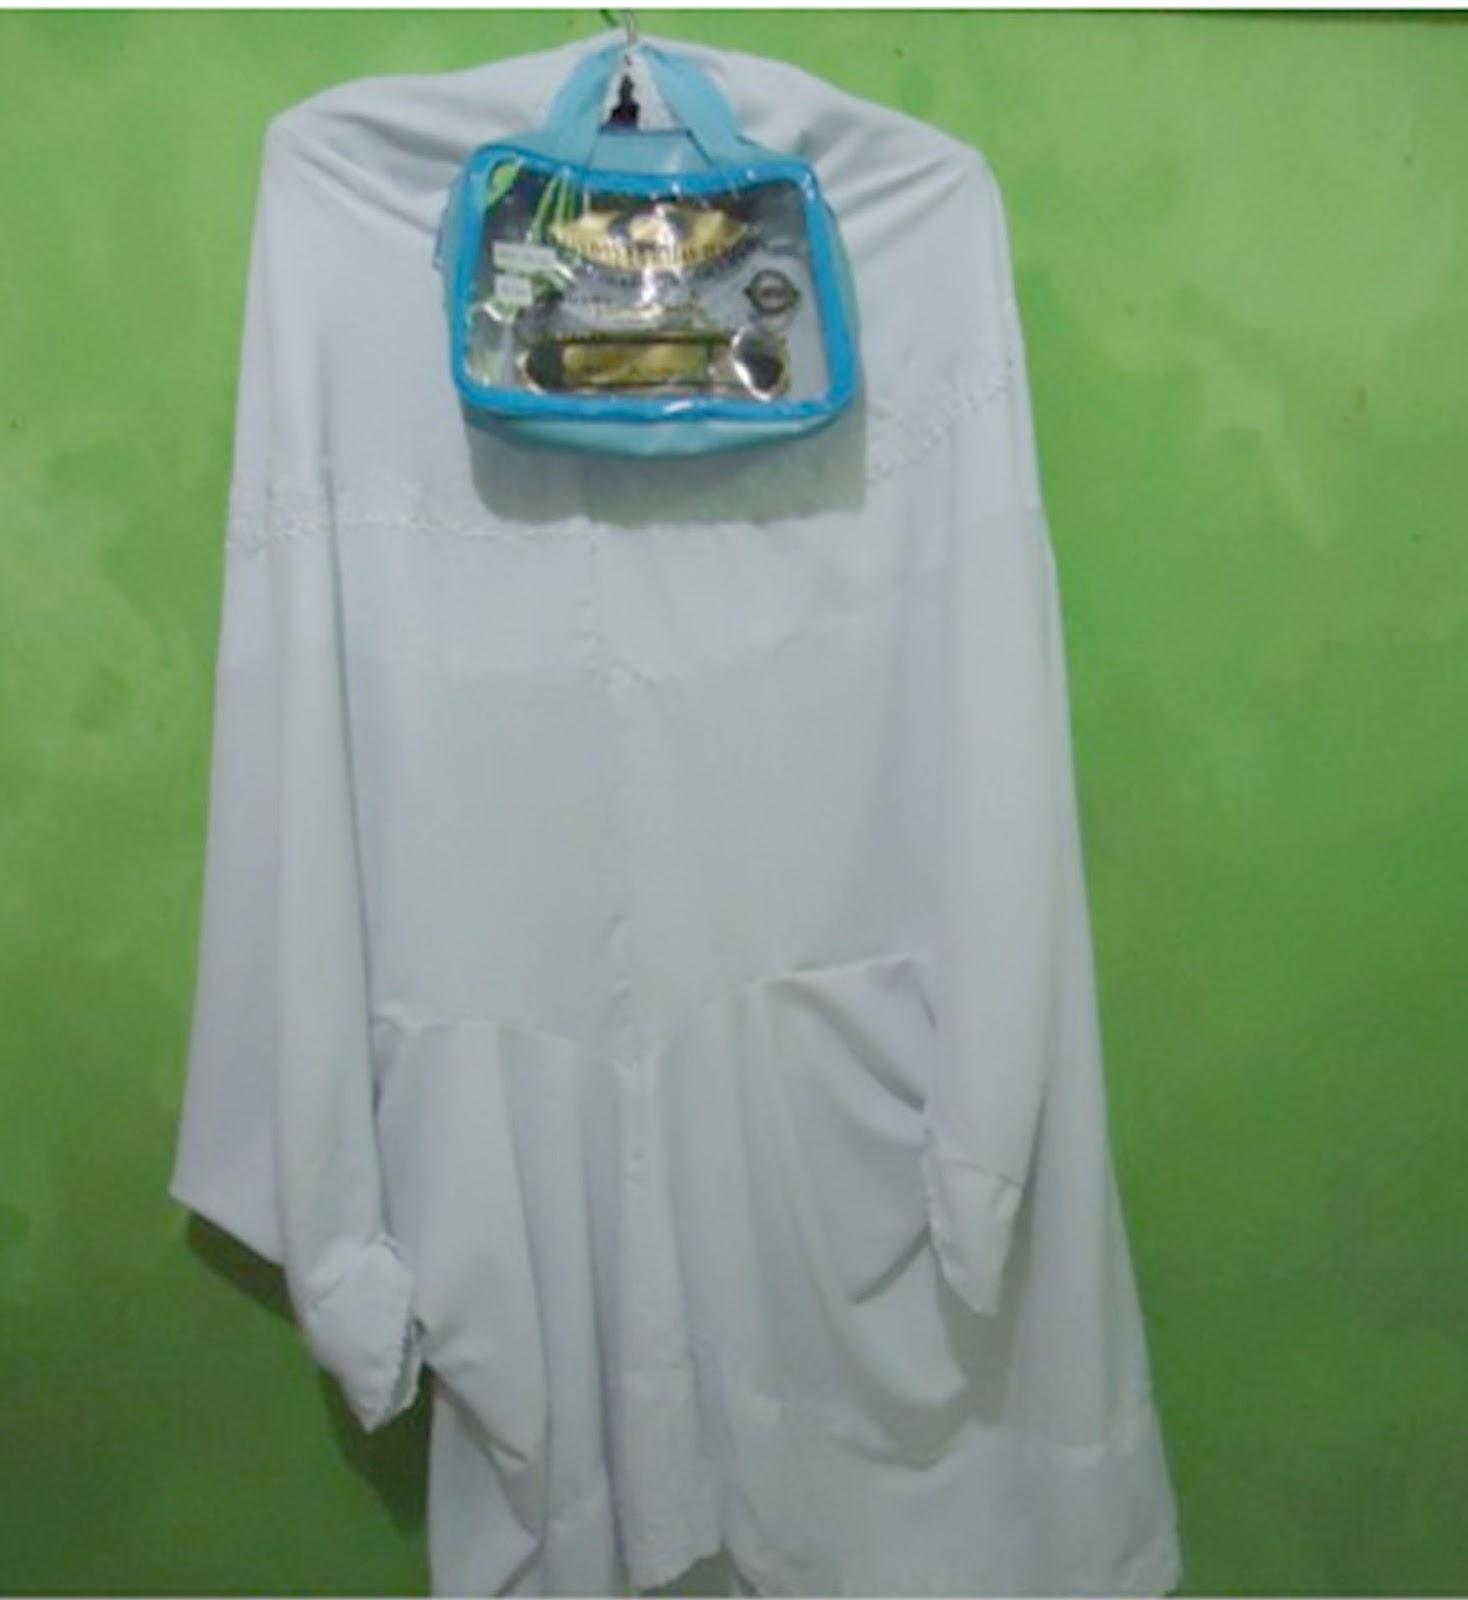 baju+panjang+3 tyafashion haji perlengkapan haji wanita,Model Baju Ihrom Wanita